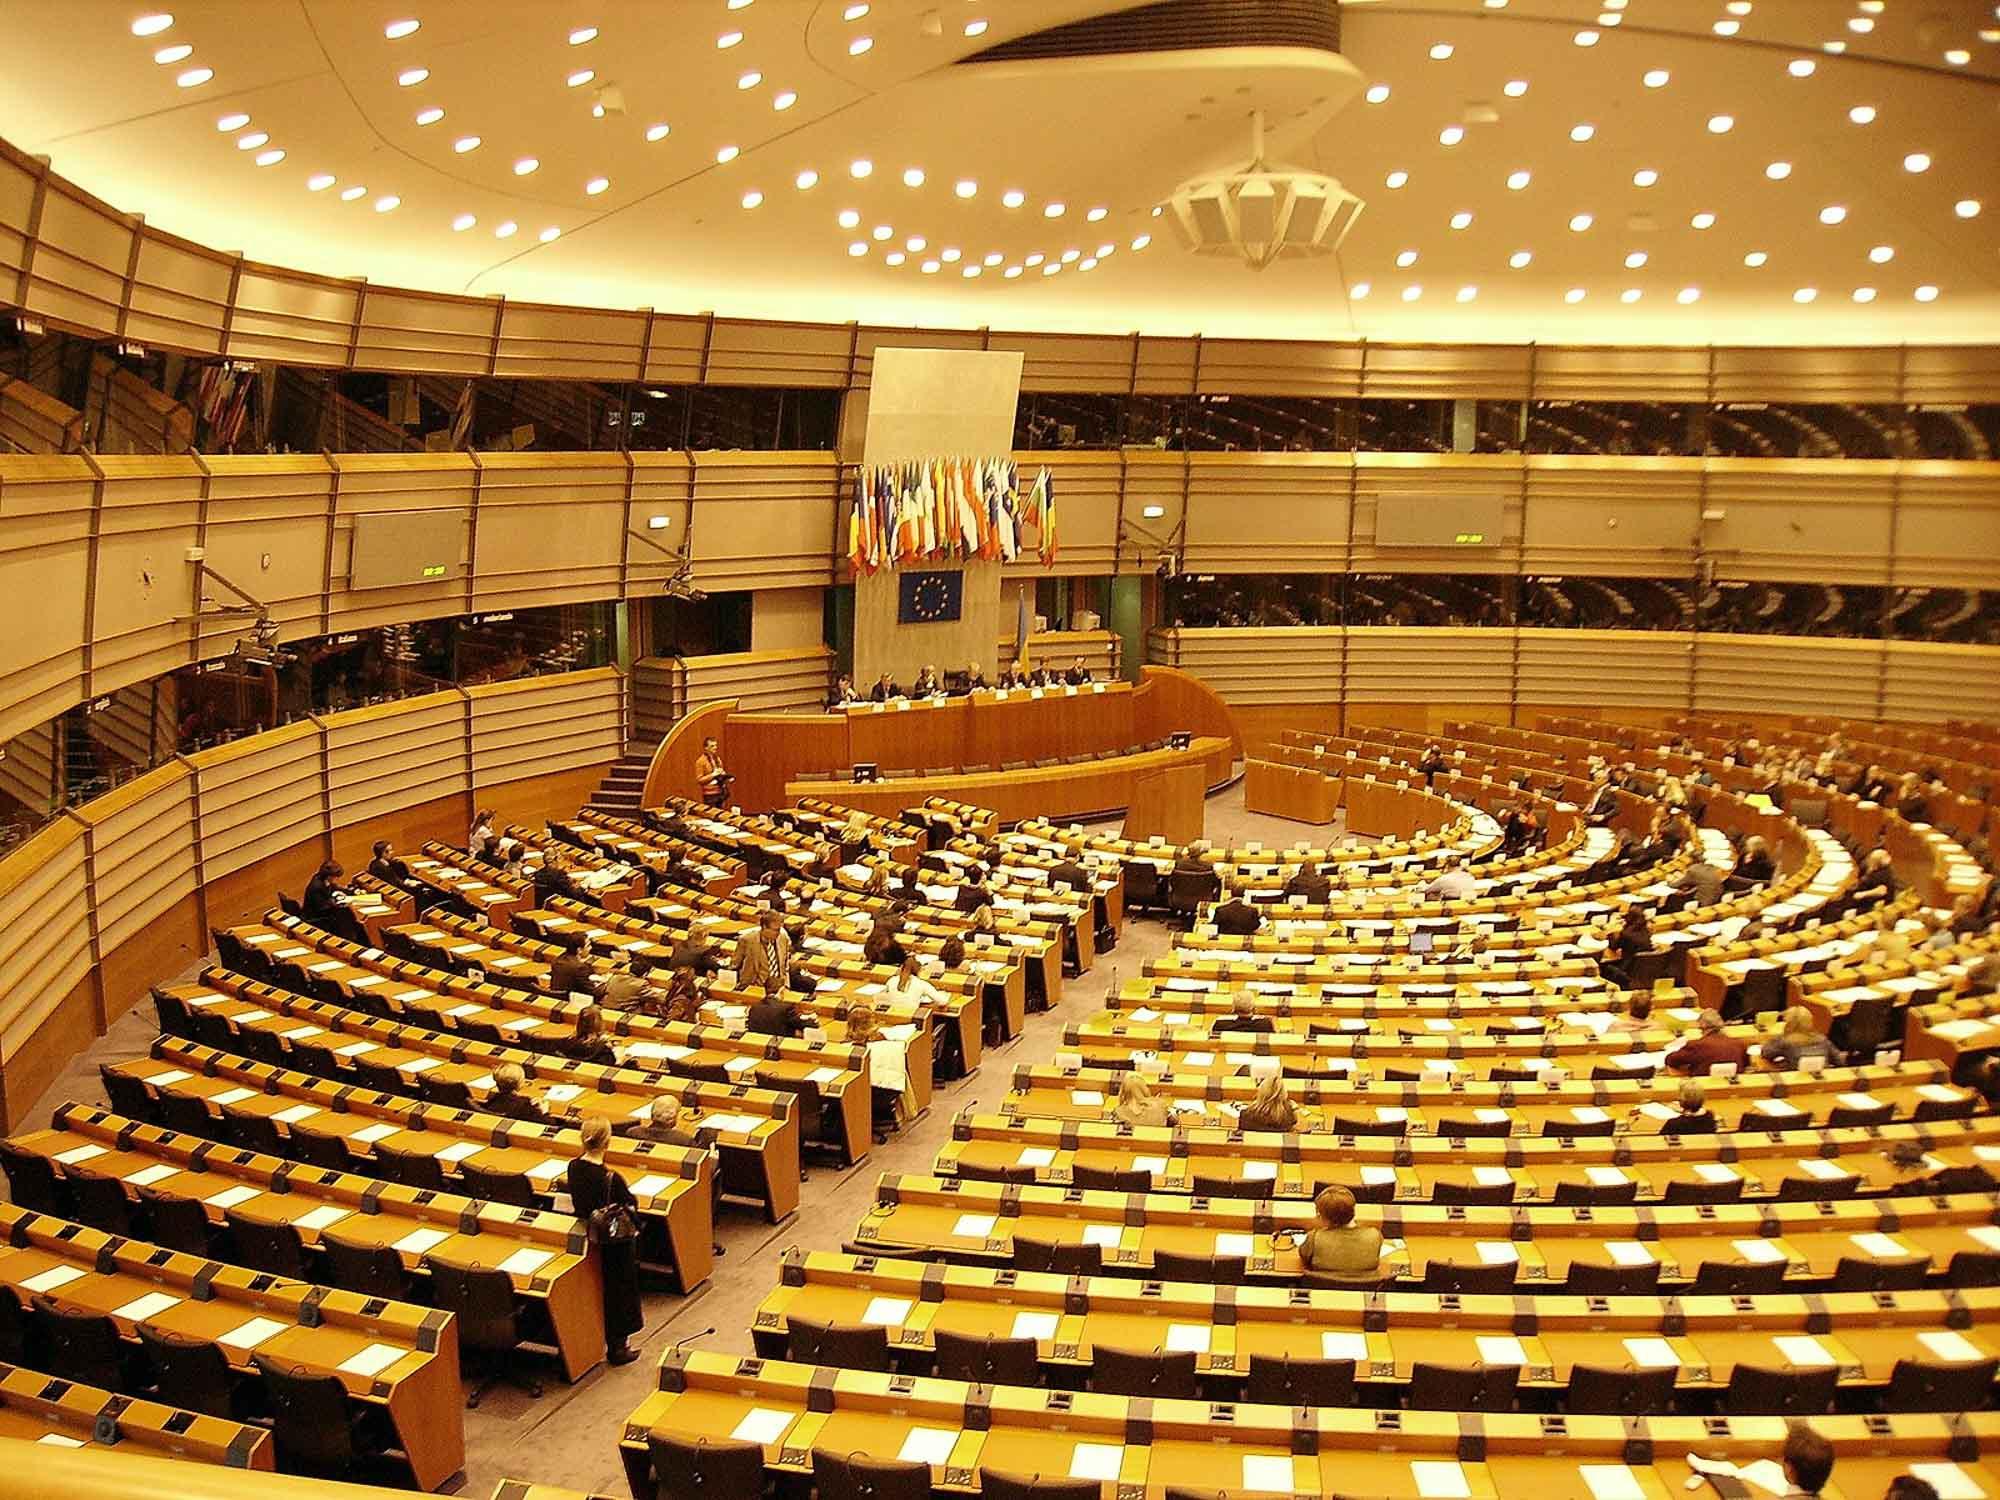 FO_1600px-European-parliament-brussels-inside_WOS35-361600 x 1200.jpg